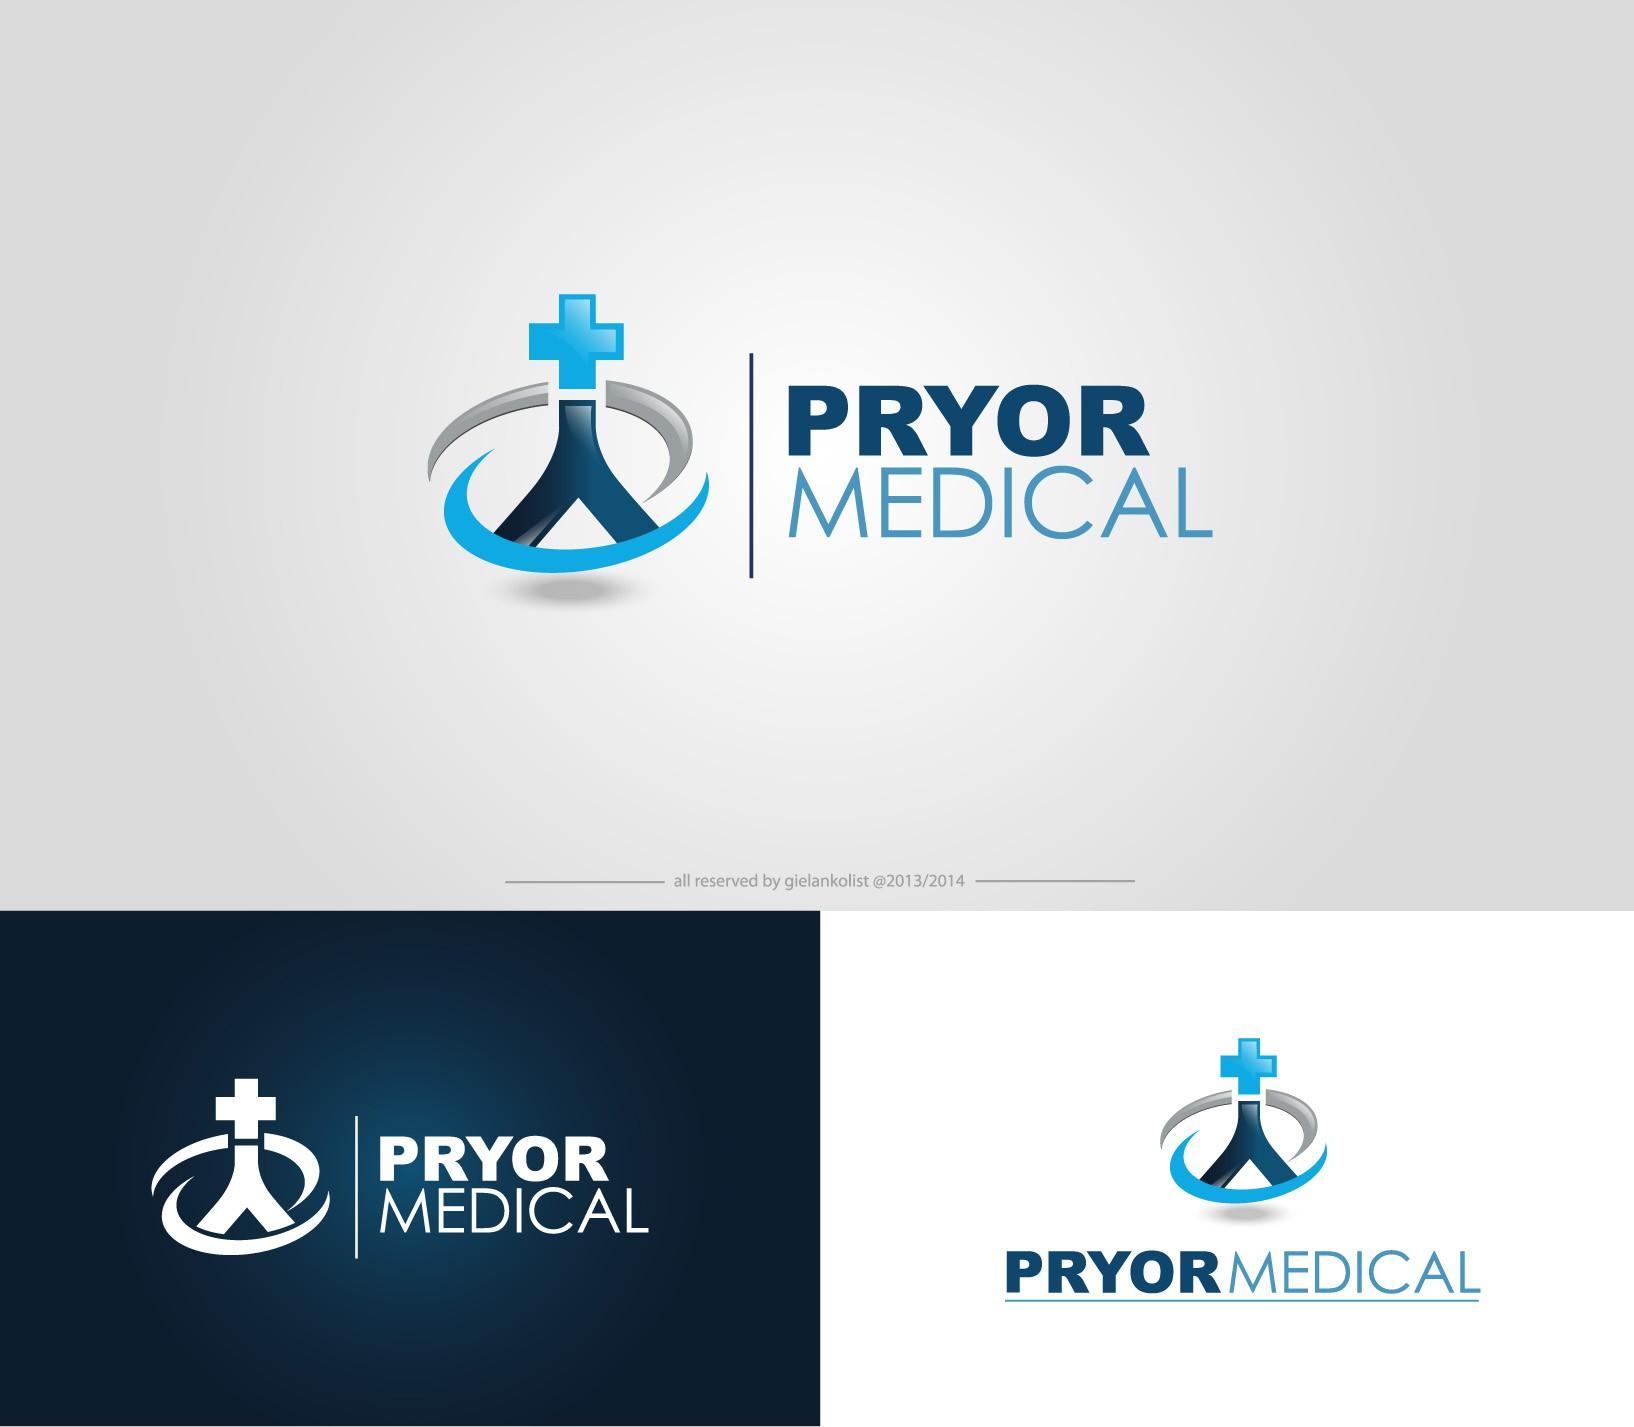 Pryor Medical needs a new logo